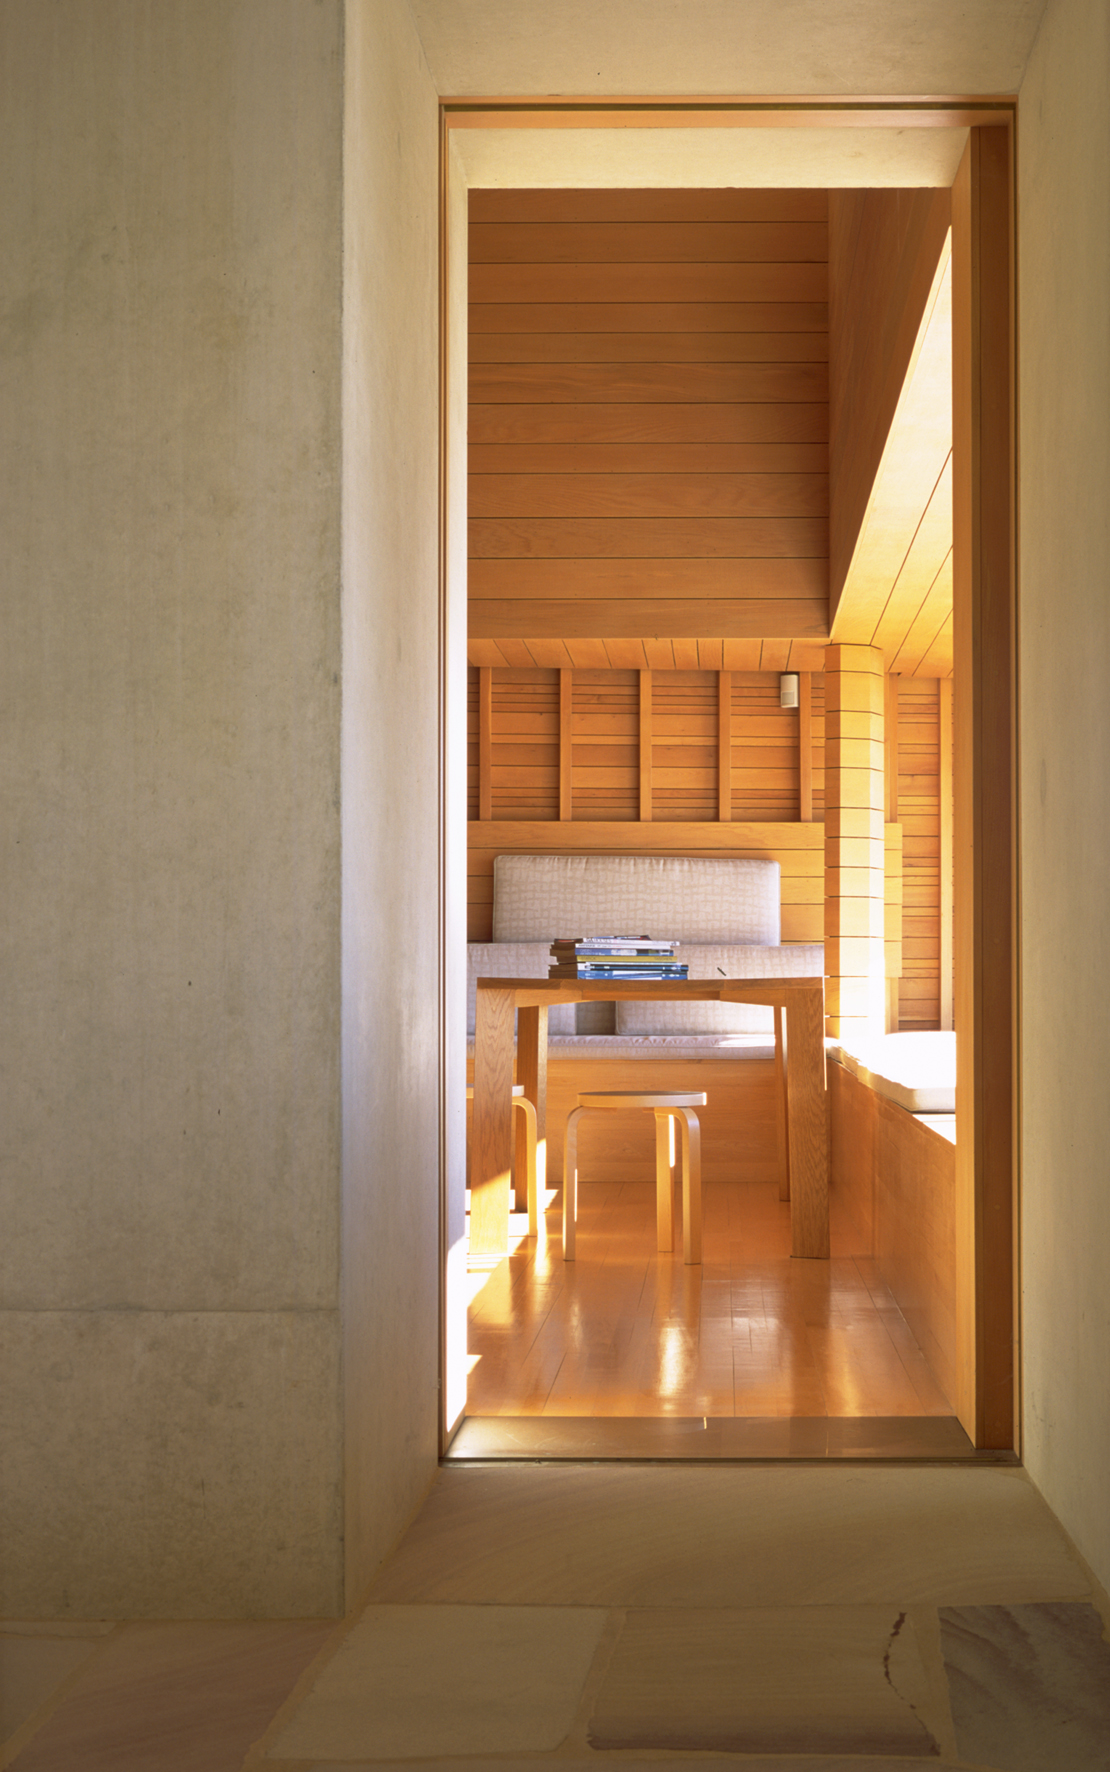 C House_TLinkins_Hallway to Great Room.jpg